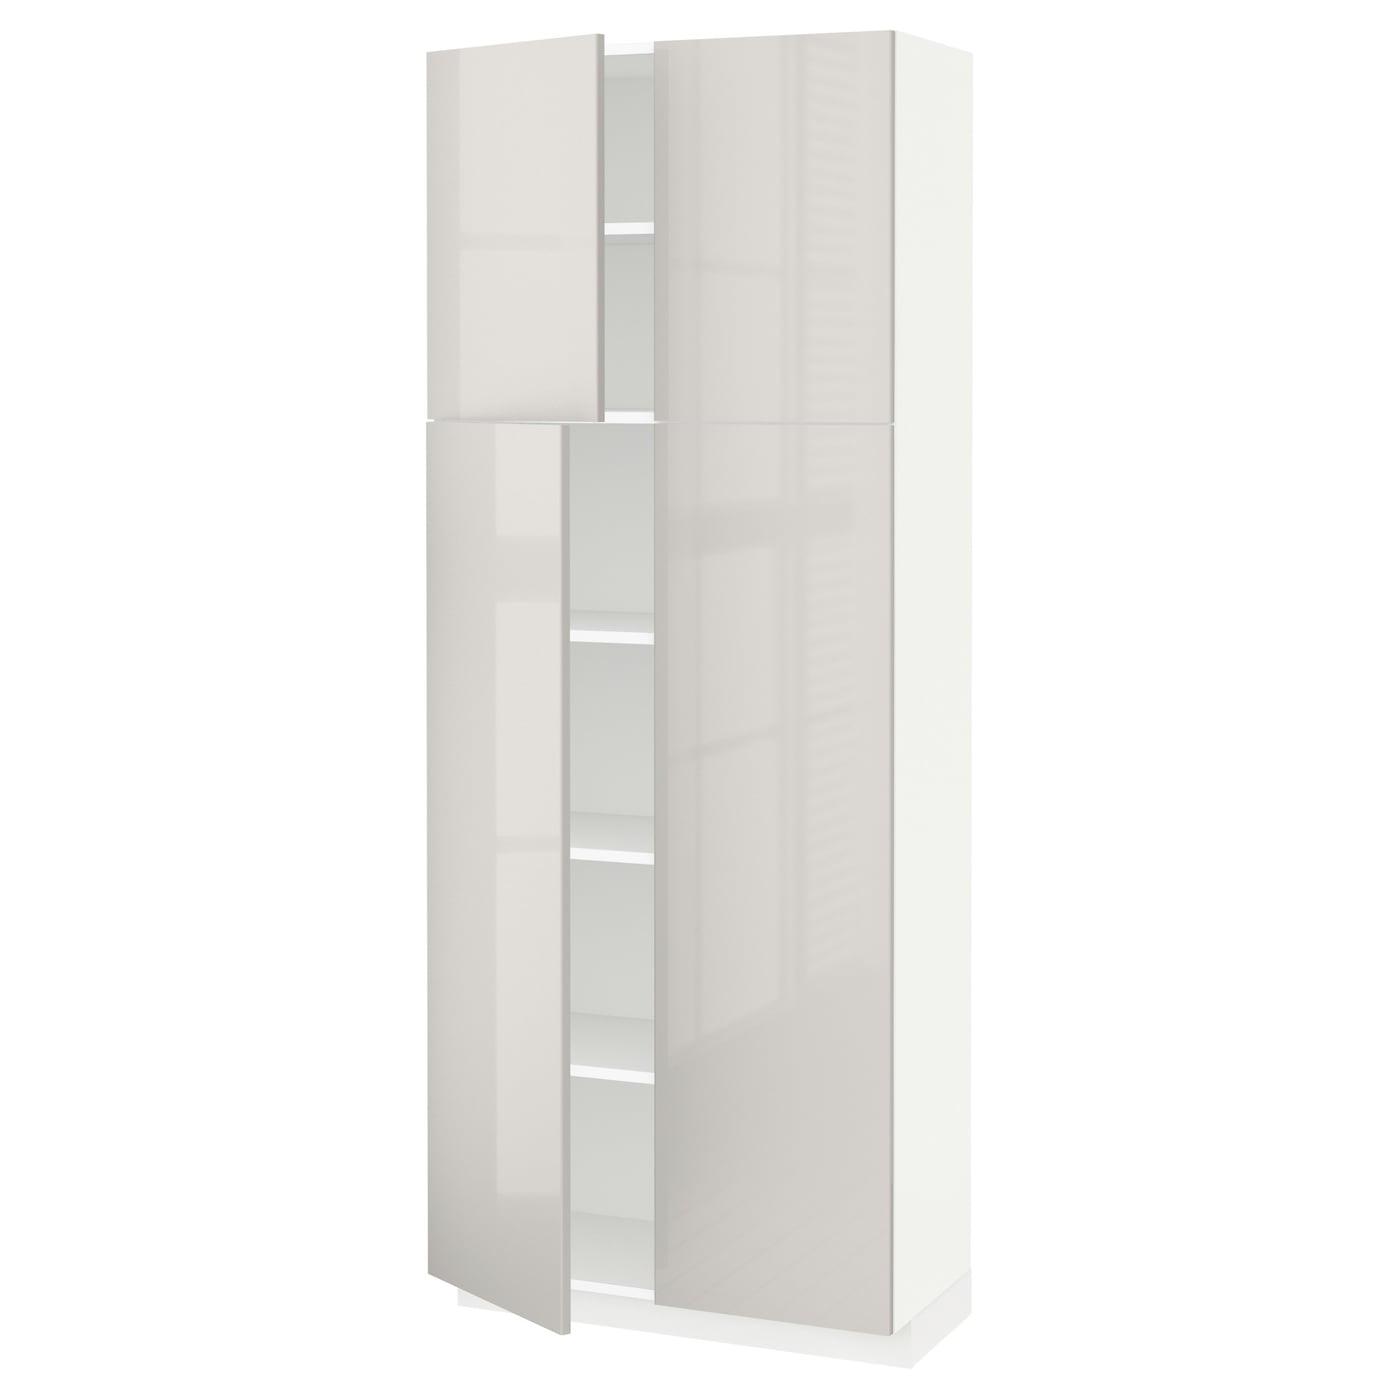 metod armoire avec tablettes 4 portes blanc ringhult gris. Black Bedroom Furniture Sets. Home Design Ideas